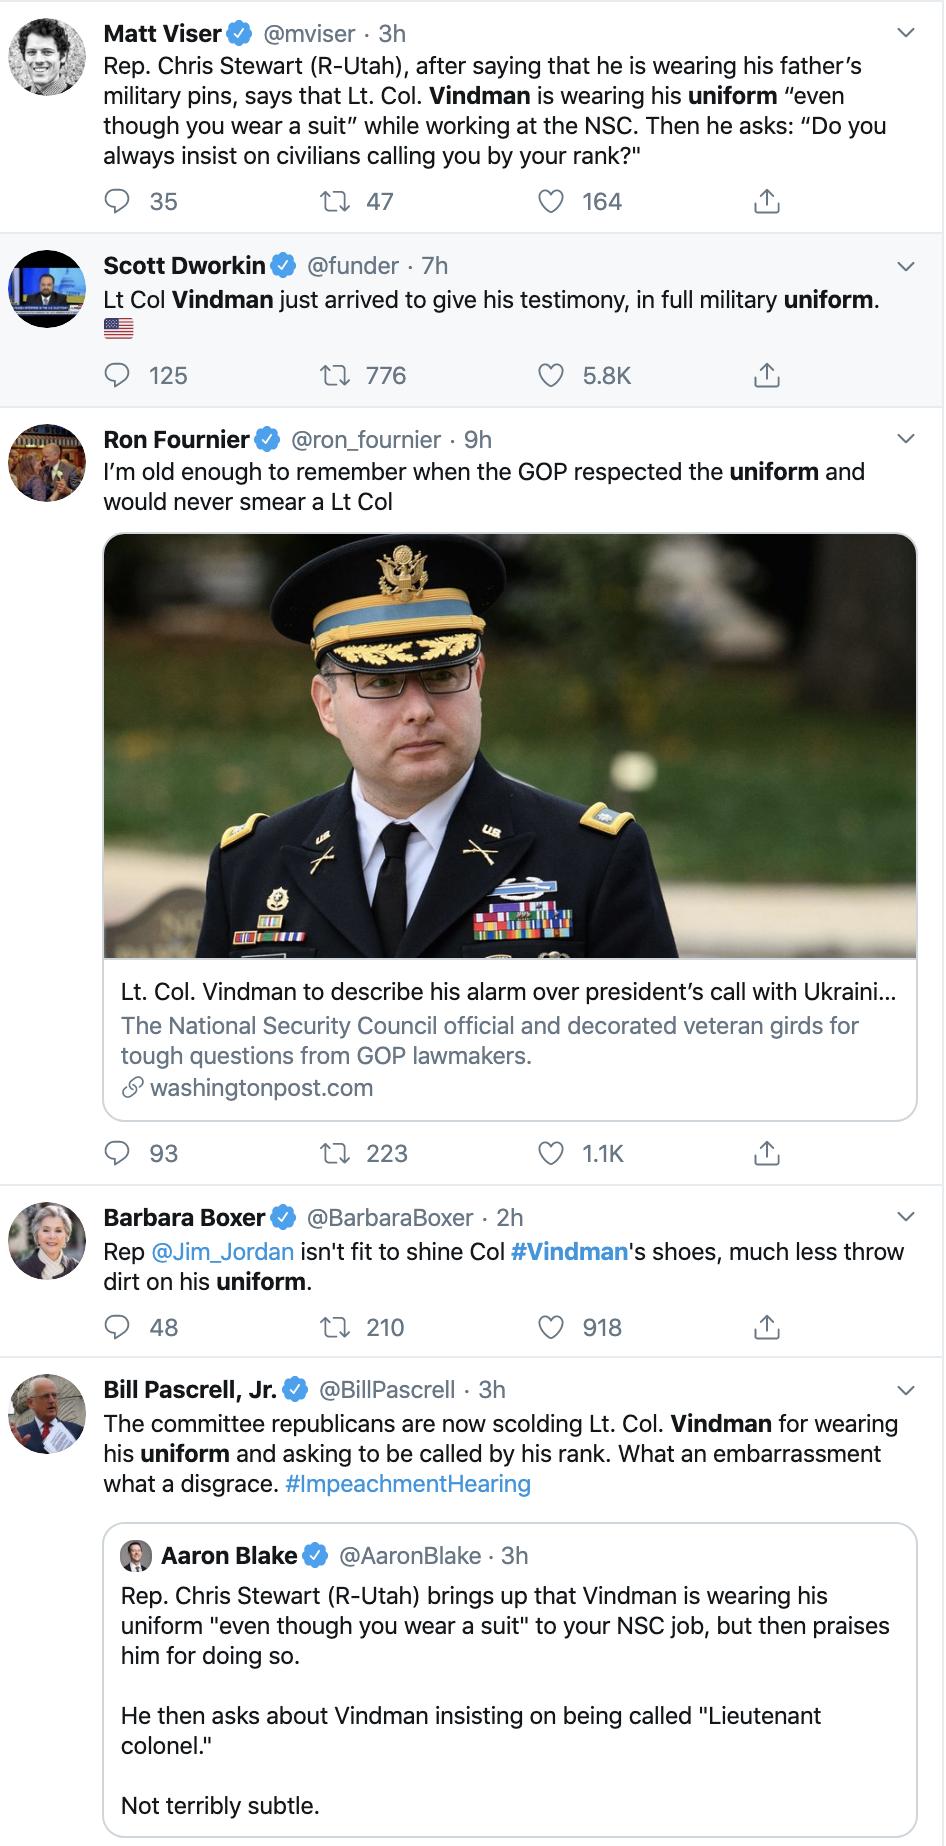 Screen-Shot-2019-11-19-at-3.12.44-PM Trump Derides Vindman For Wearing His Uniform During Testimony Donald Trump Impeachment Military Top Stories Veterans